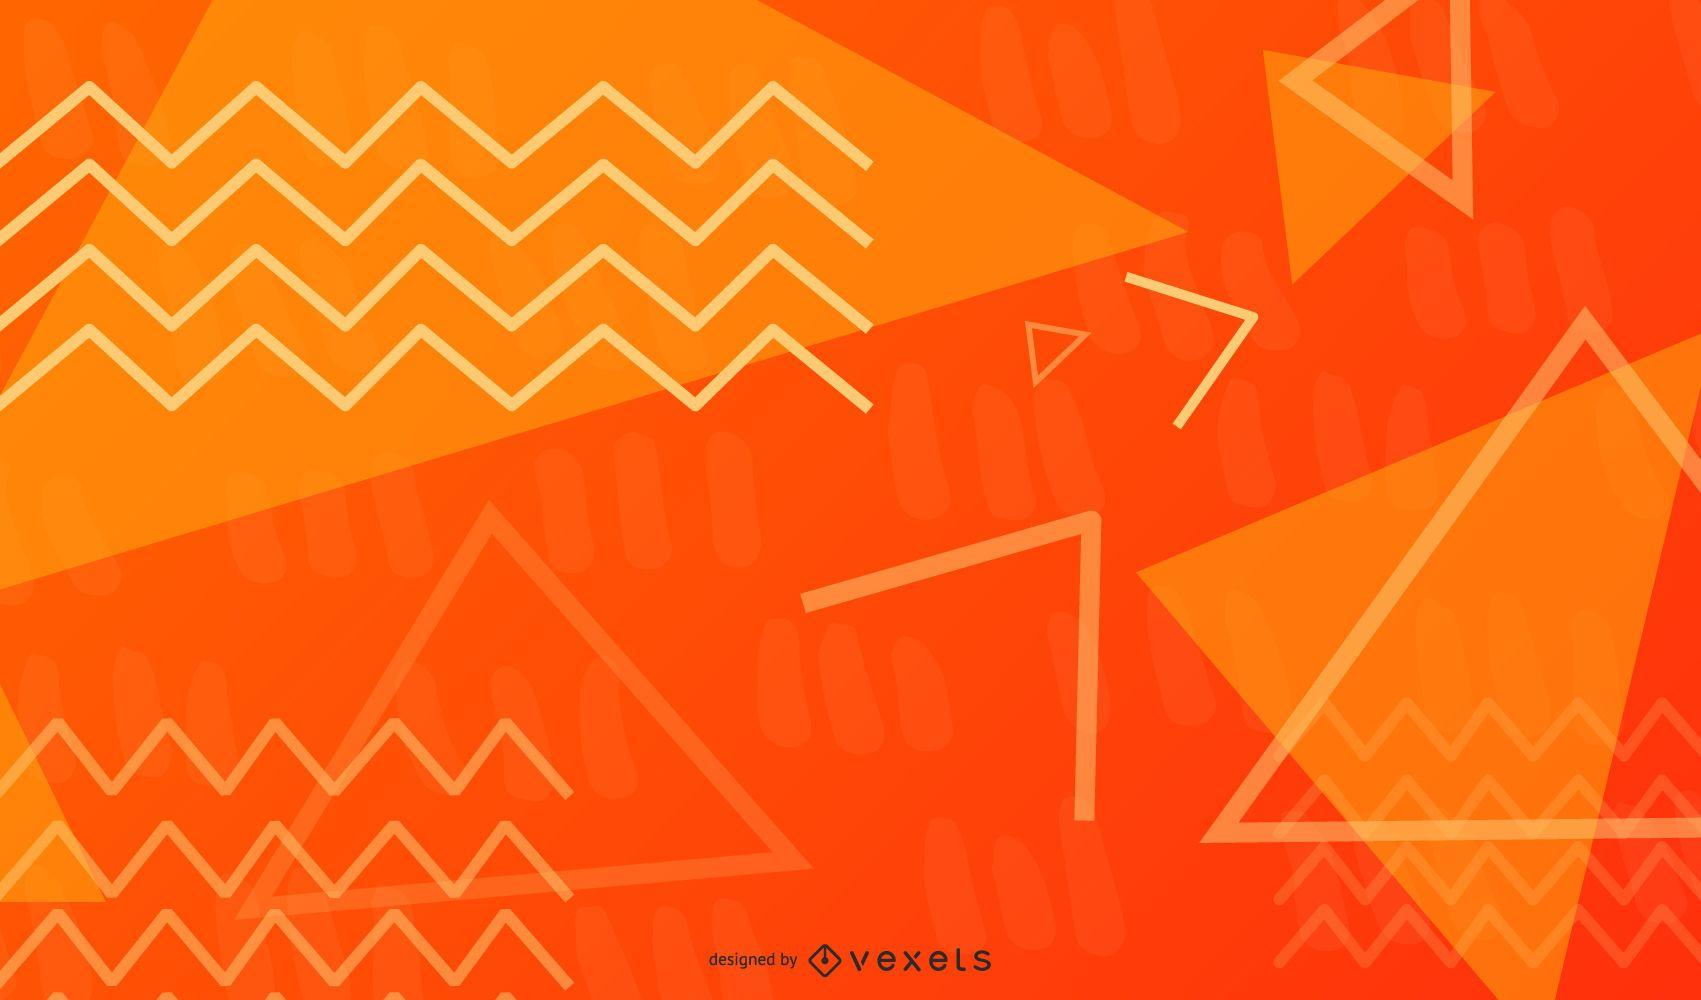 Triangle and Zig-Zag Geometric Illustration